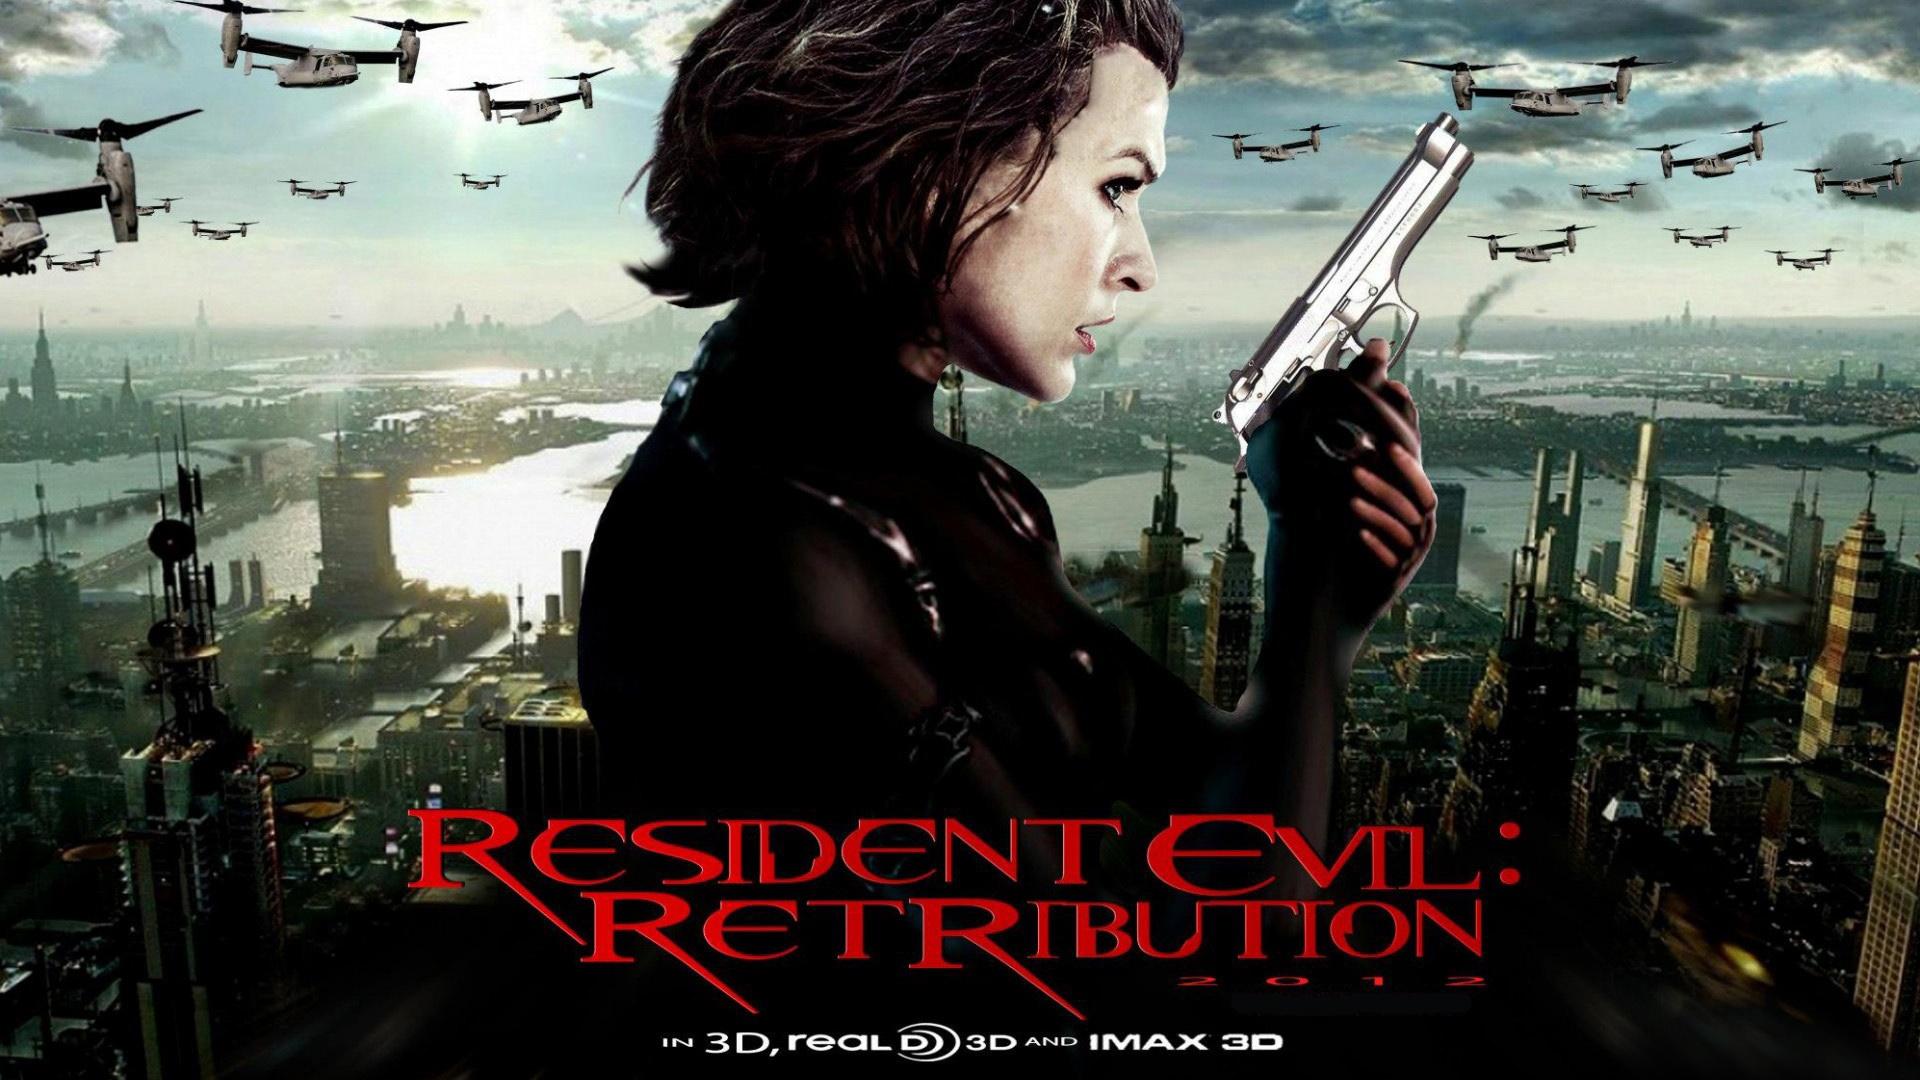 Resident Evil Retribution HD Wallpapers Backgrounds